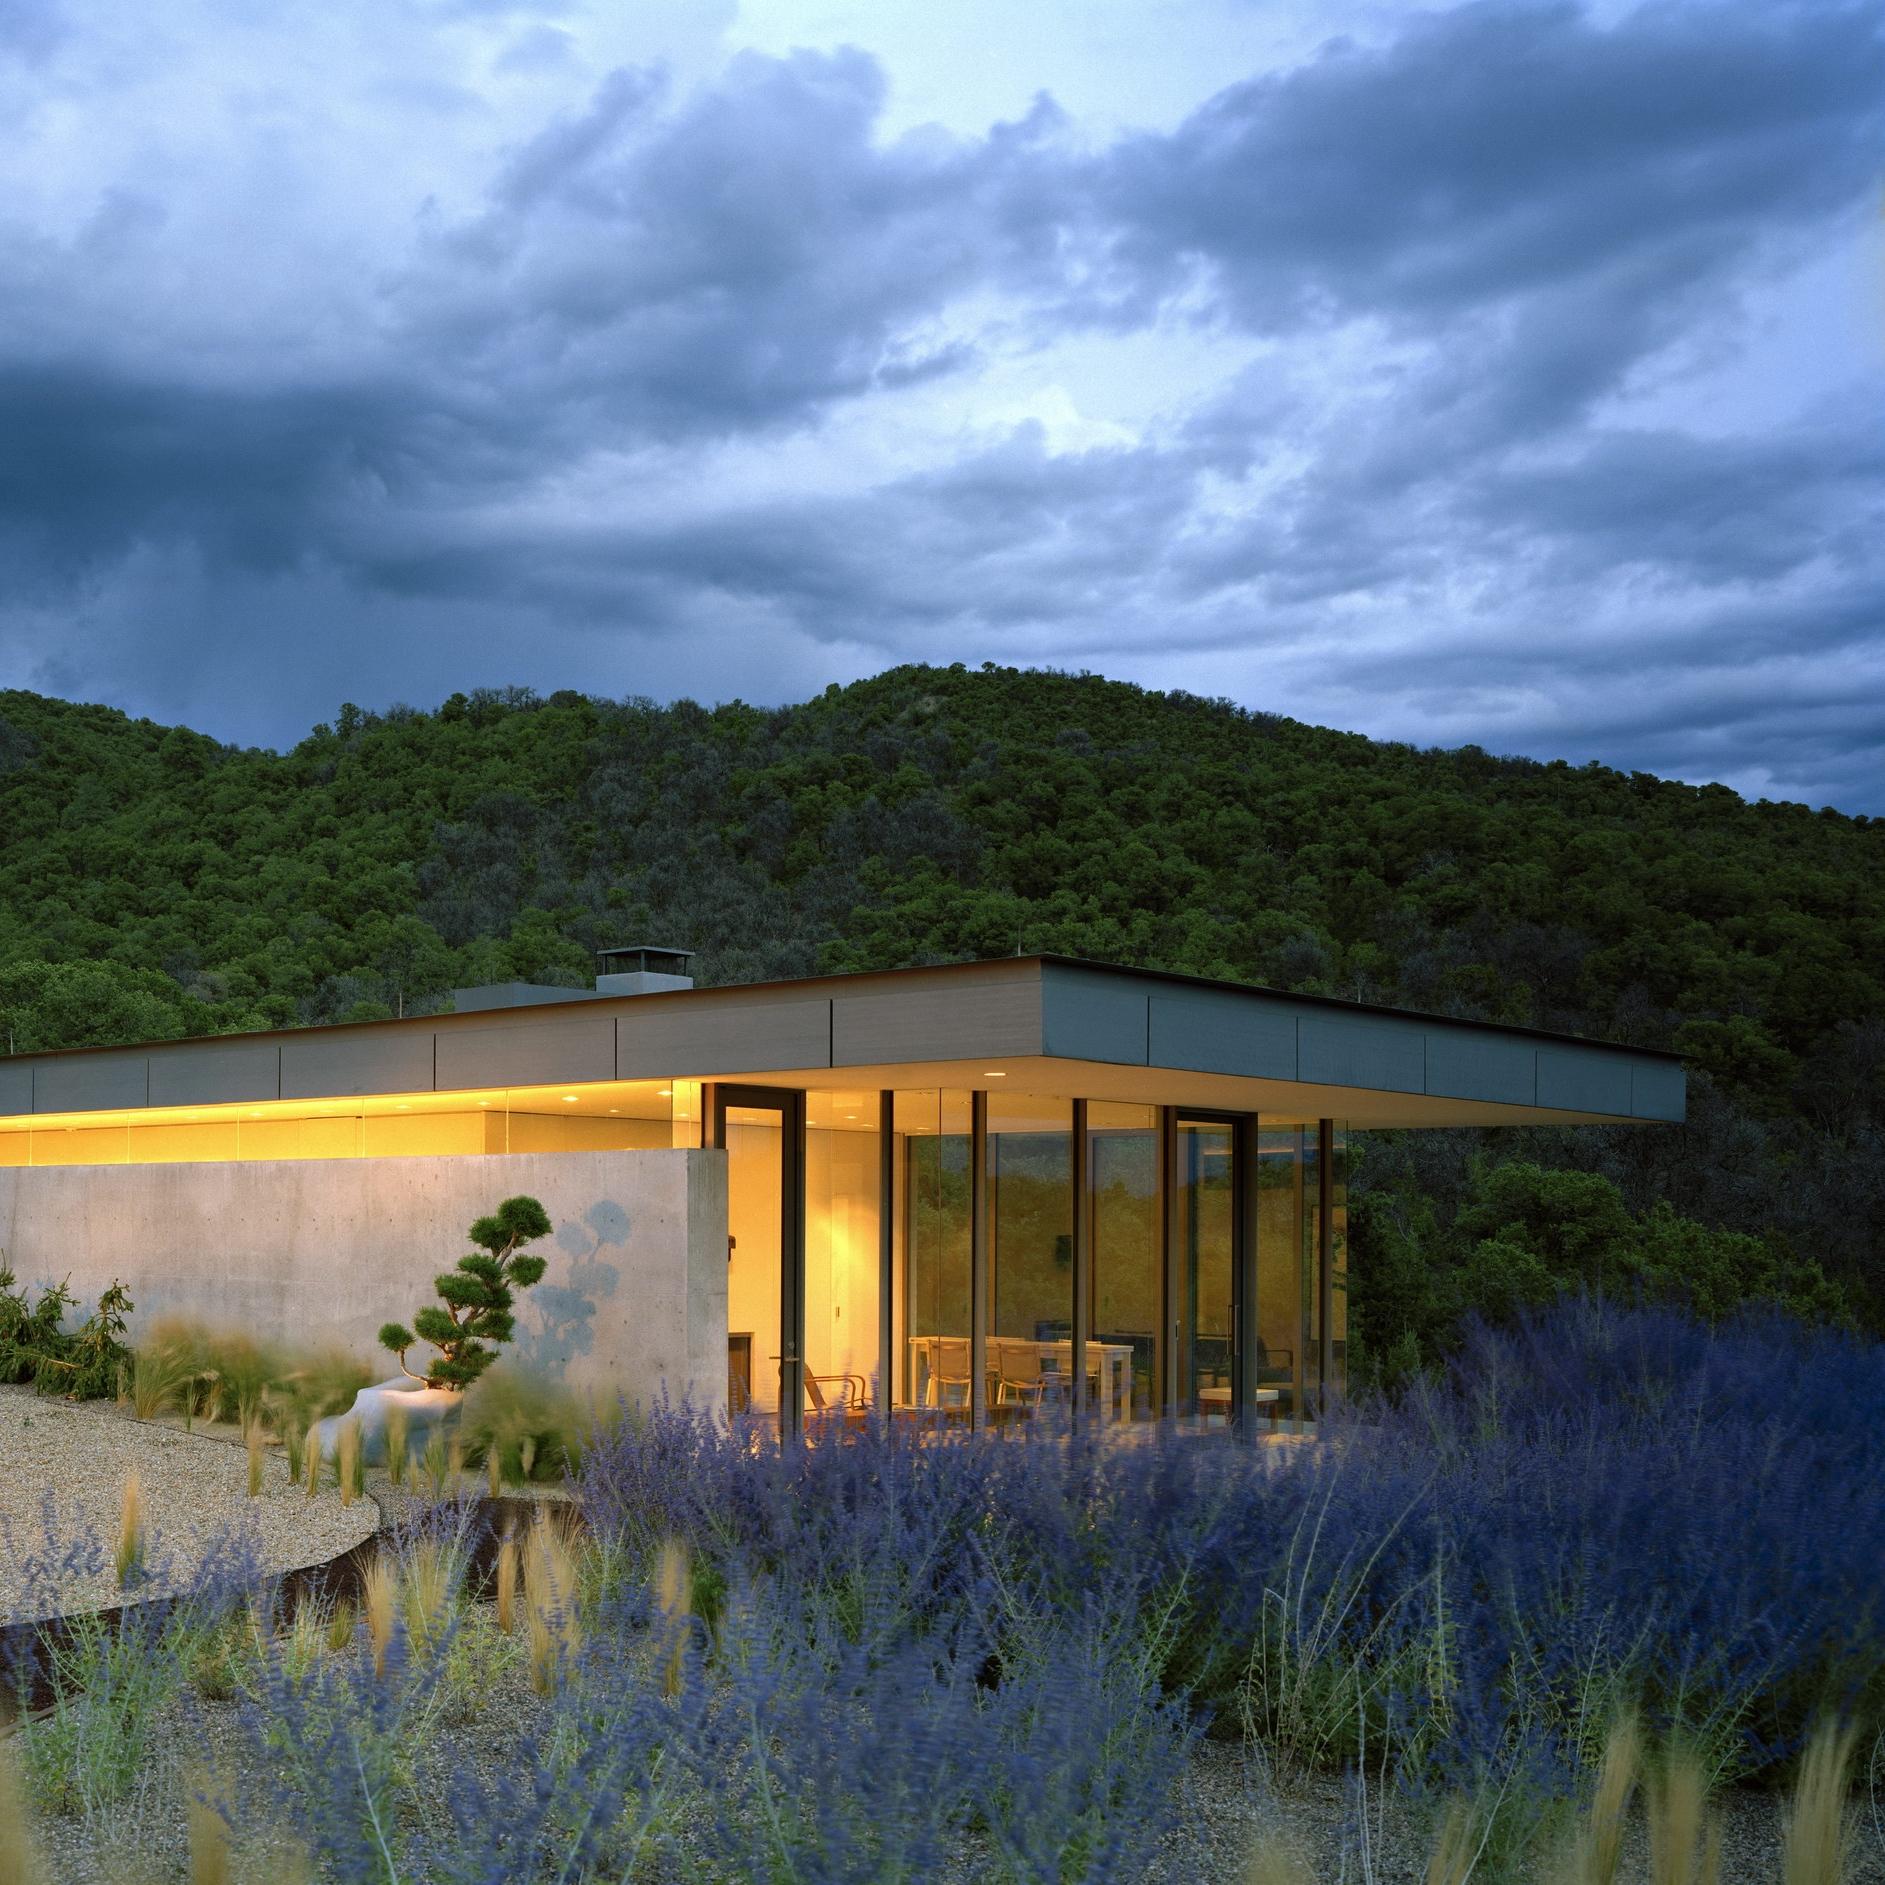 Santa Fe Guest House, New Mexico